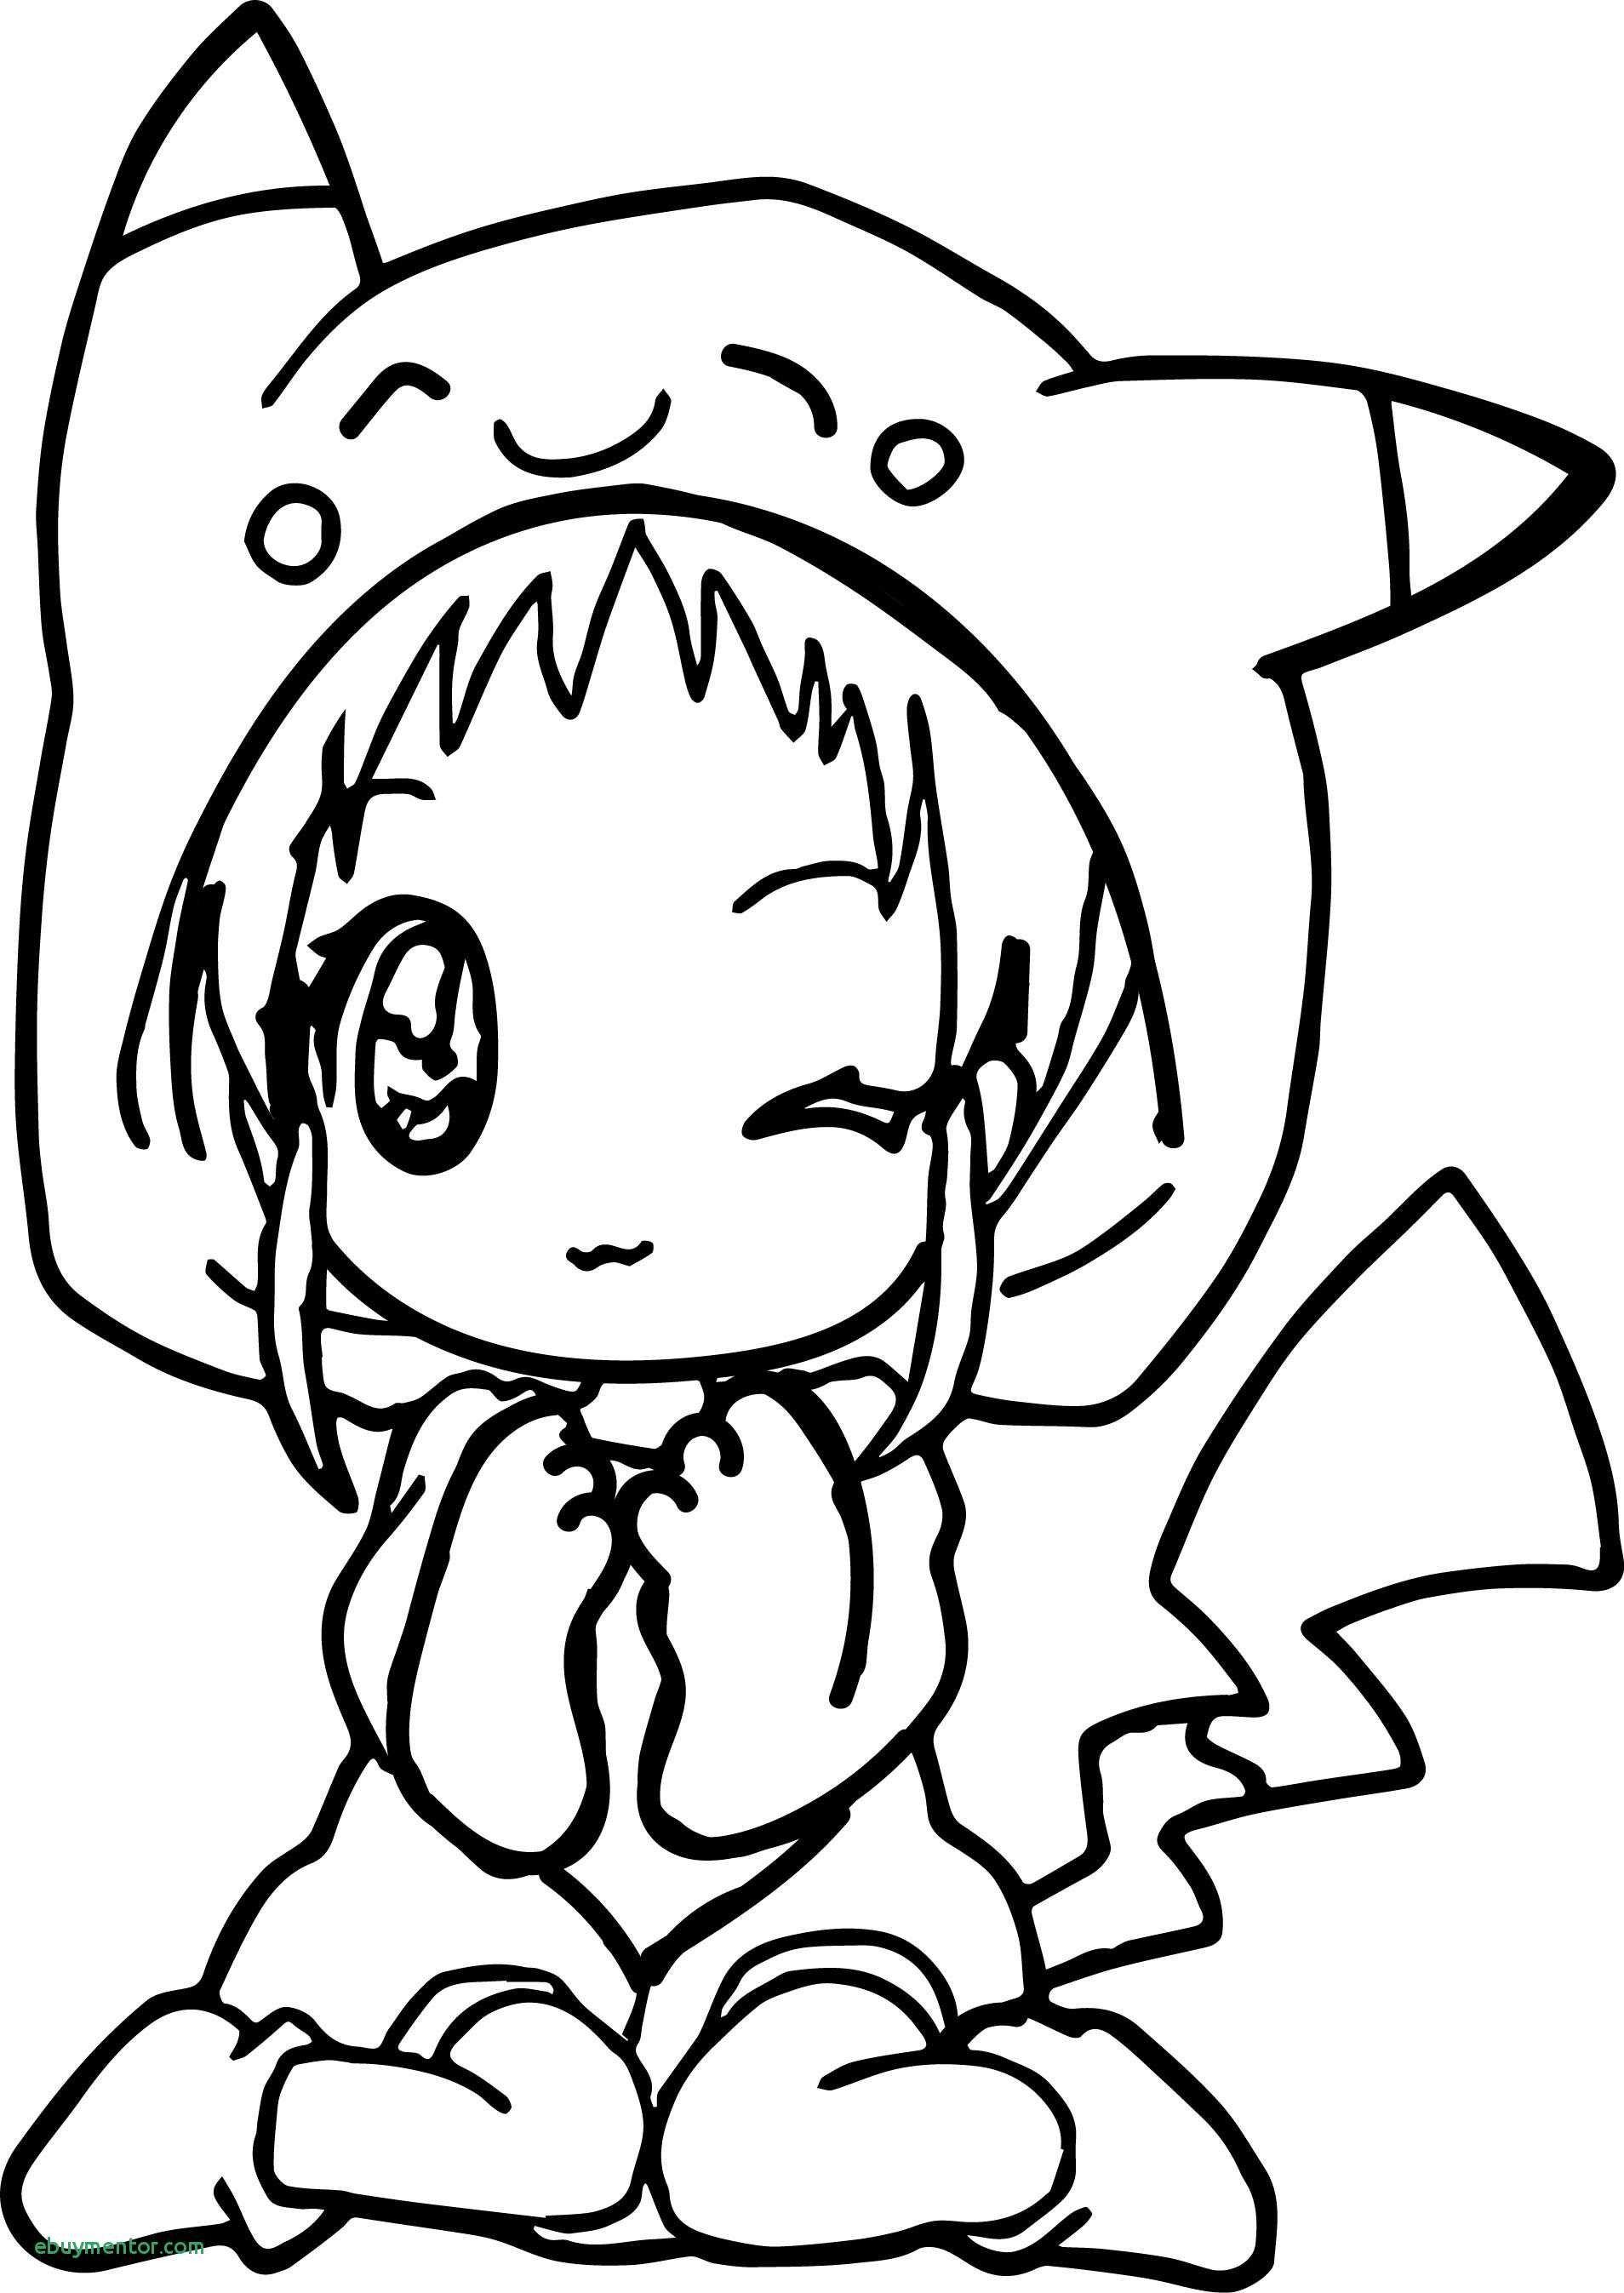 Chibi Pikachu Coloring Pages